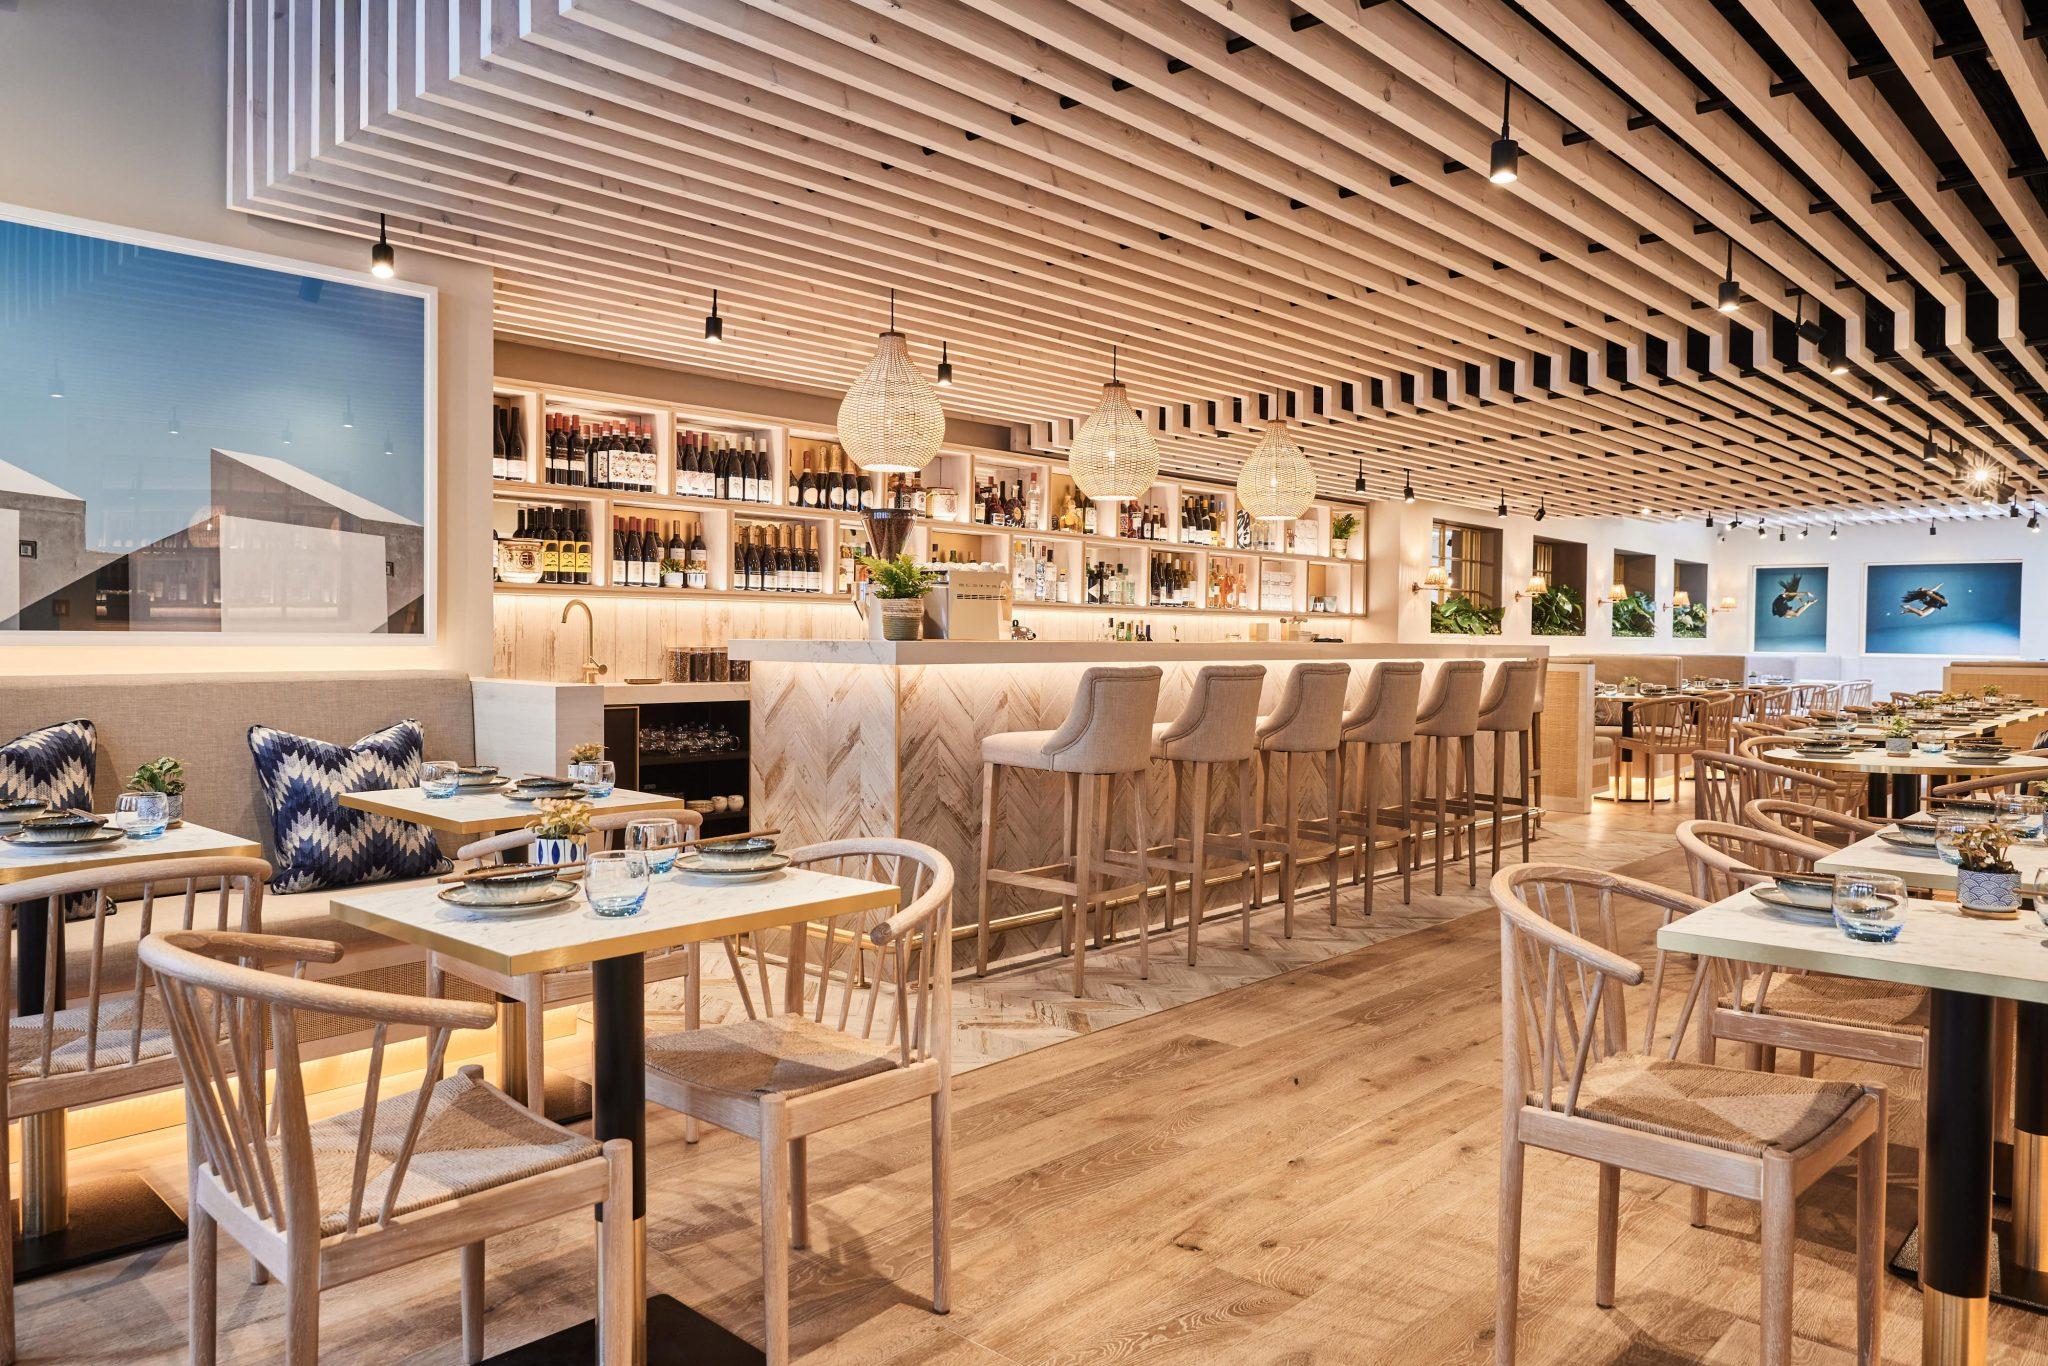 HUO restaurant interiors and bar